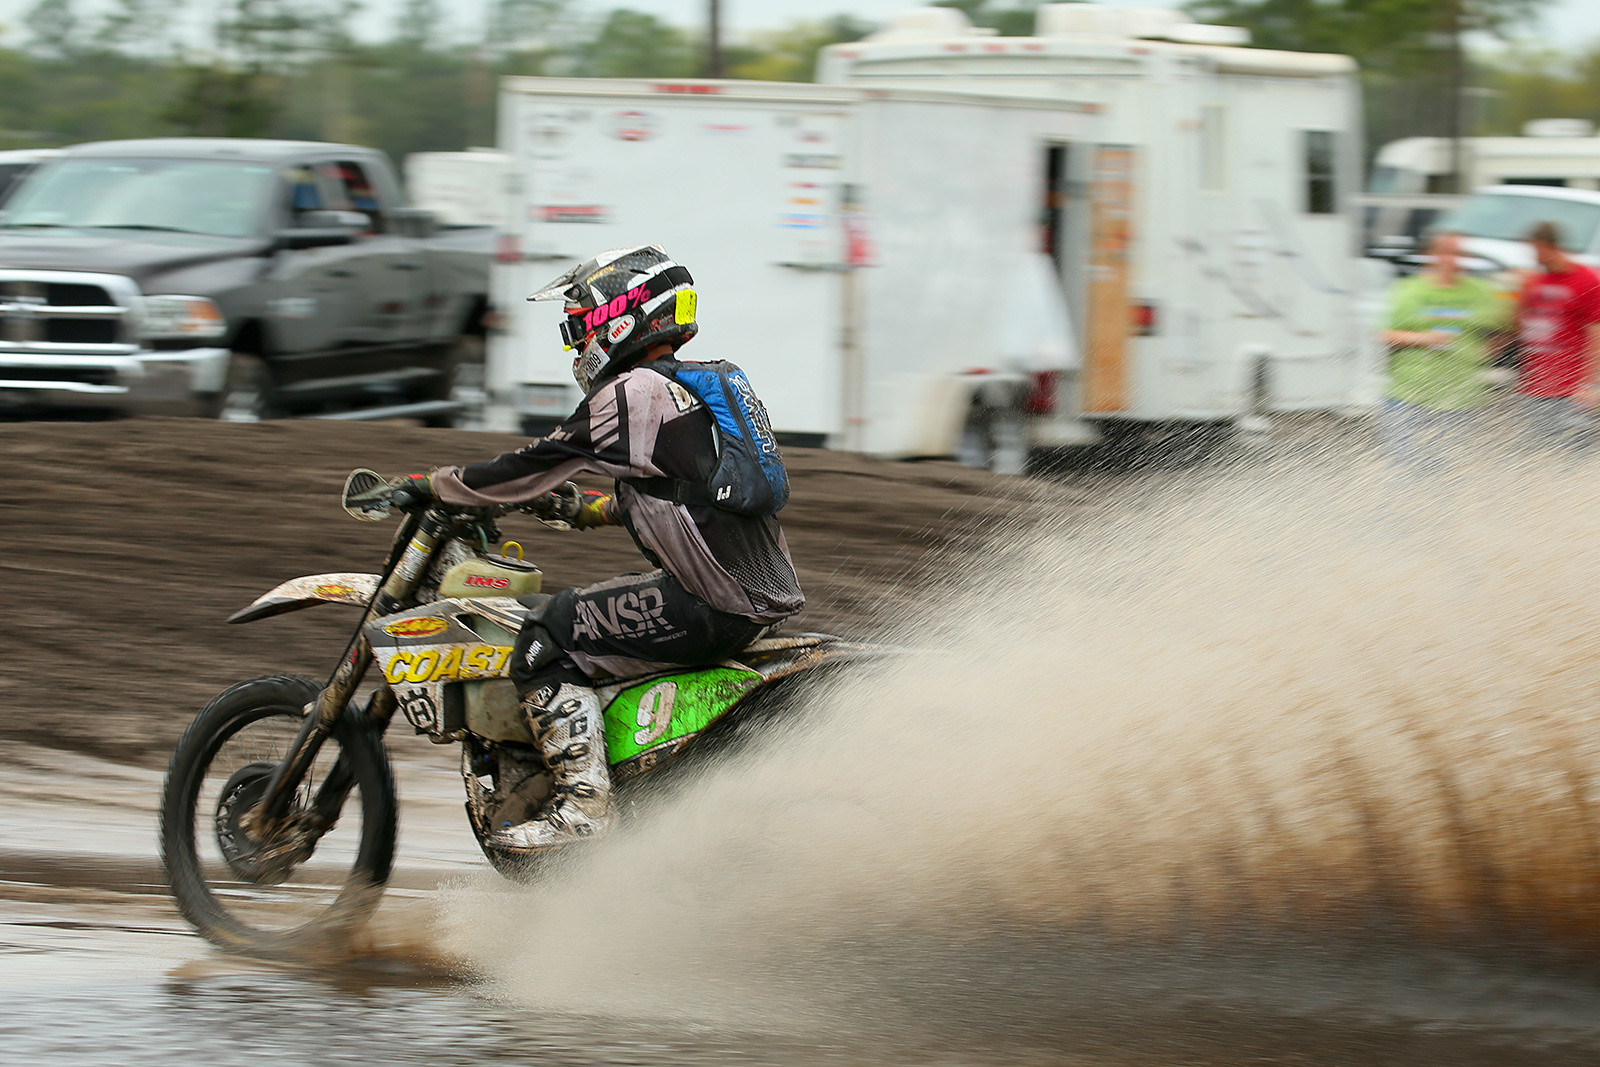 Craig DeLong - Wild Boar GNCC - Motocross Pictures - Vital MX